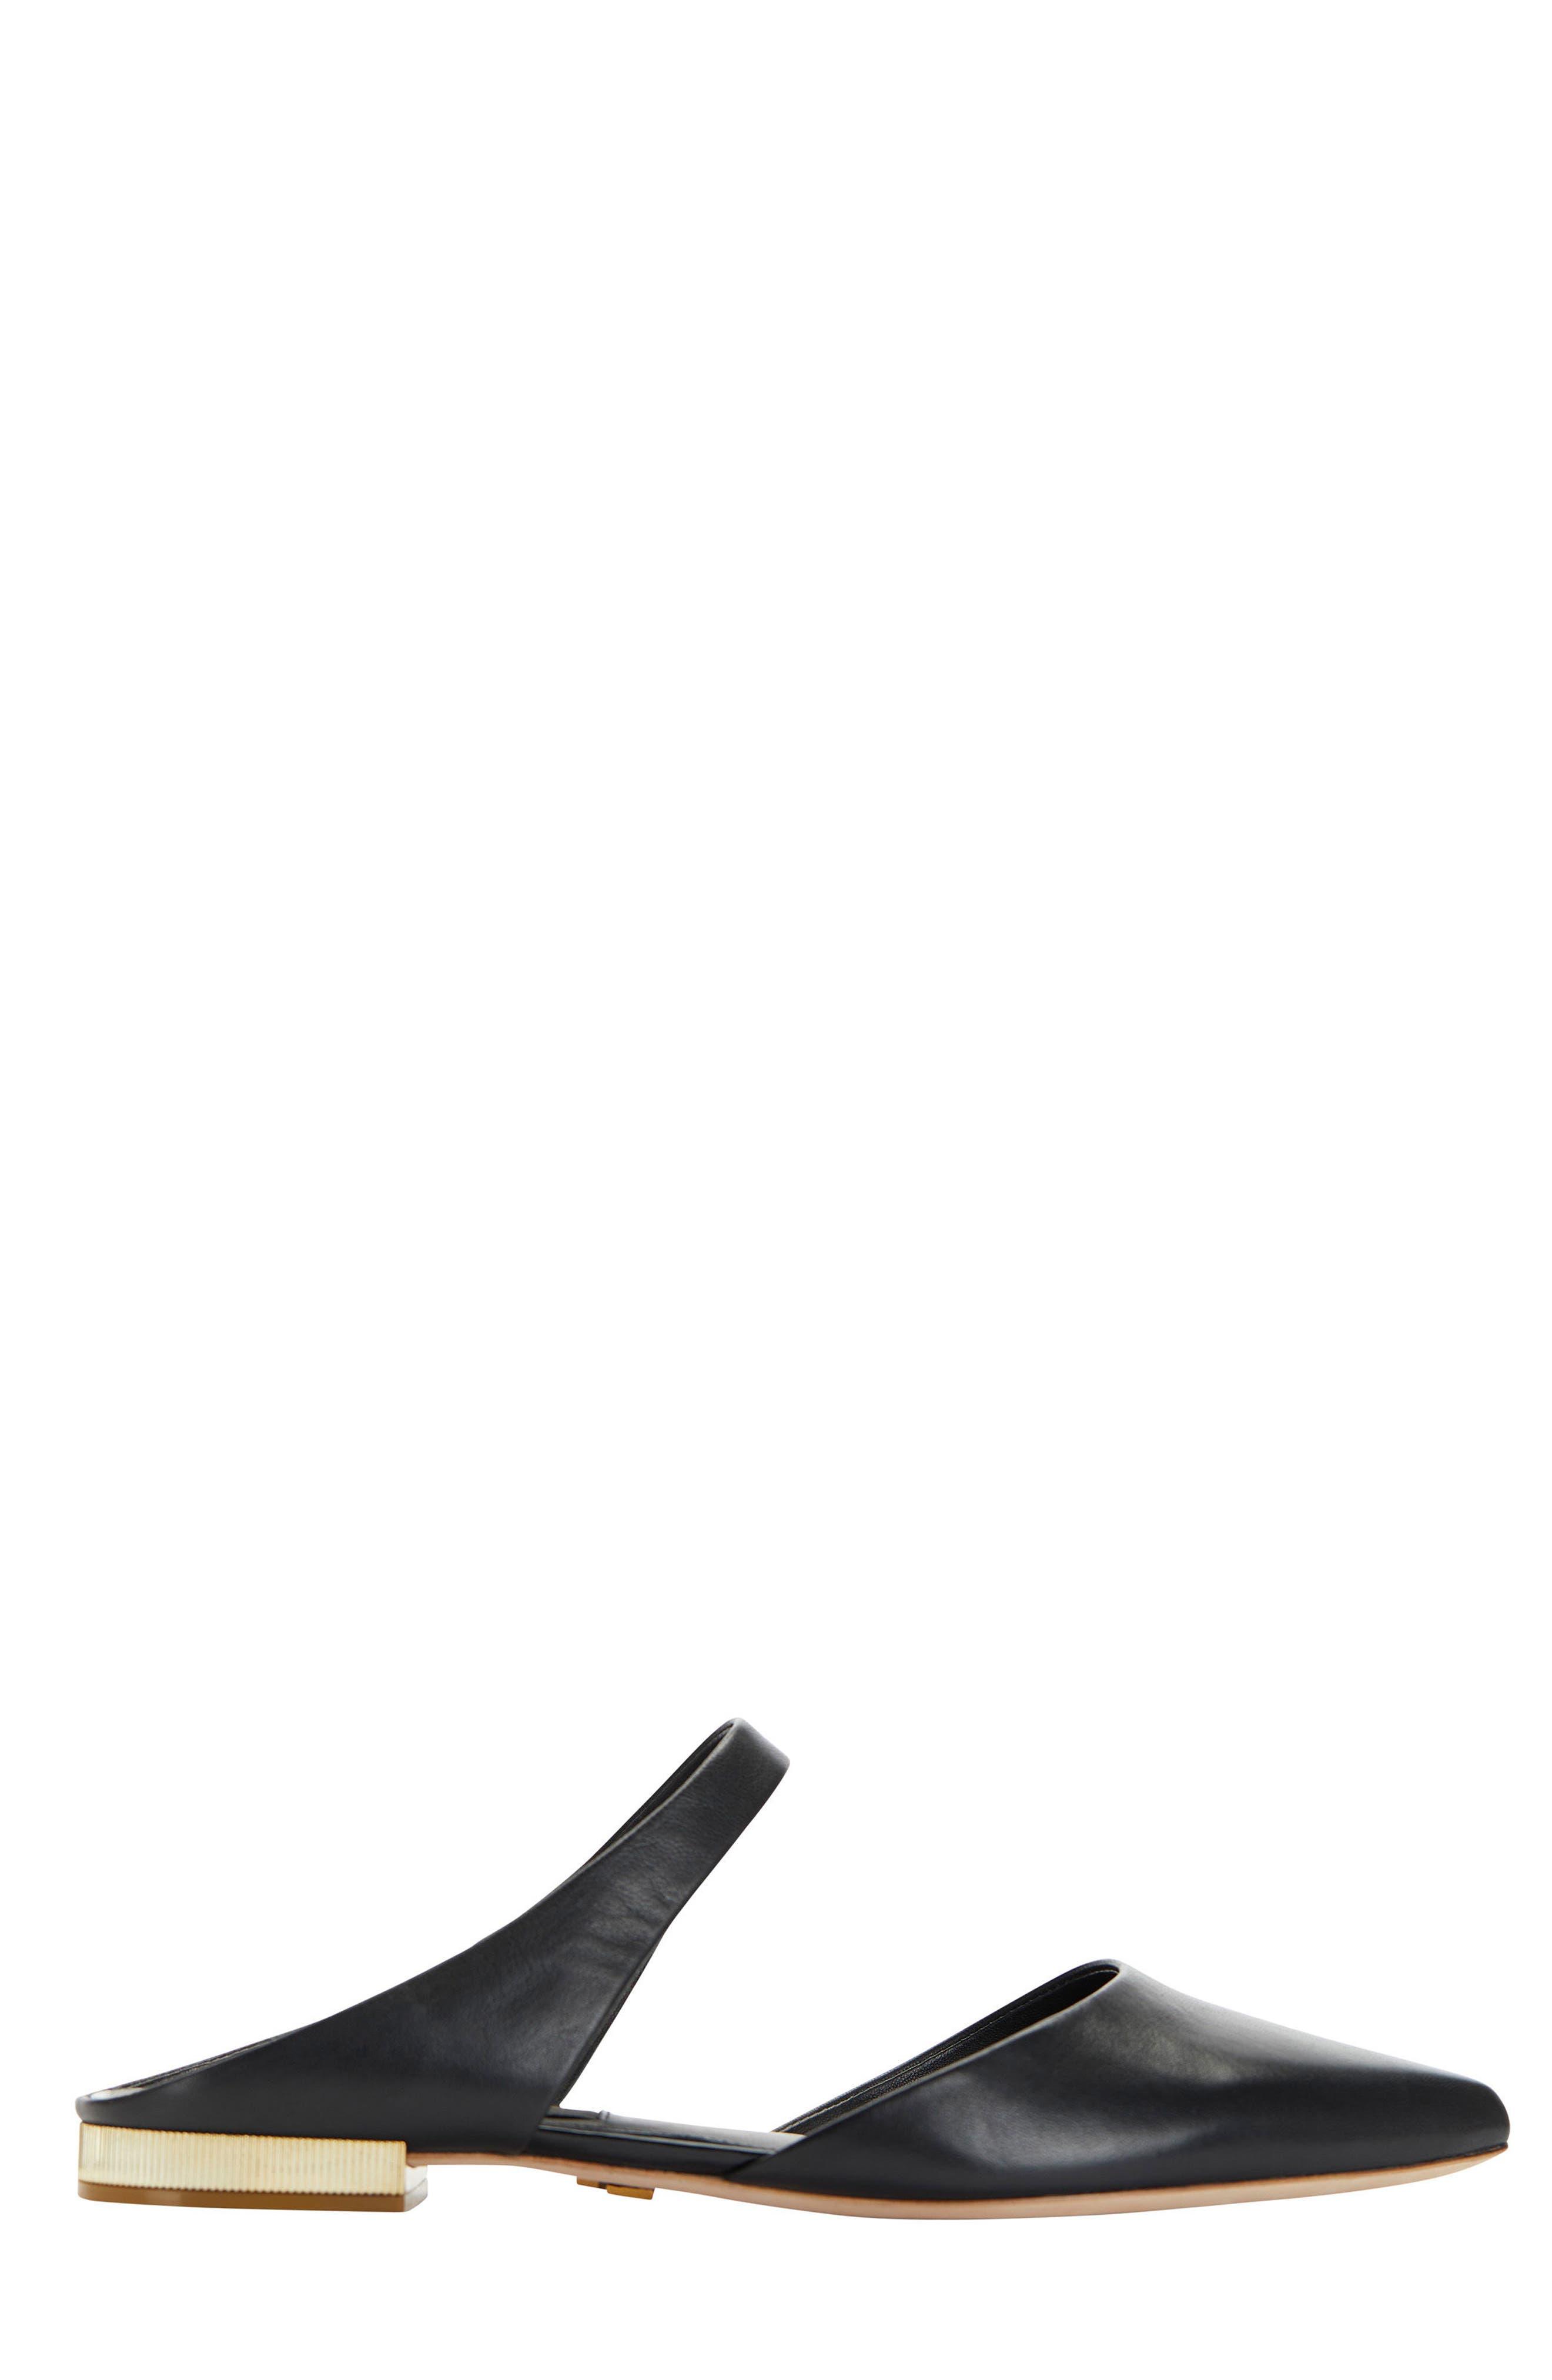 Donna Karan Paris Pointy Toe Mule,                             Alternate thumbnail 3, color,                             Black Leather